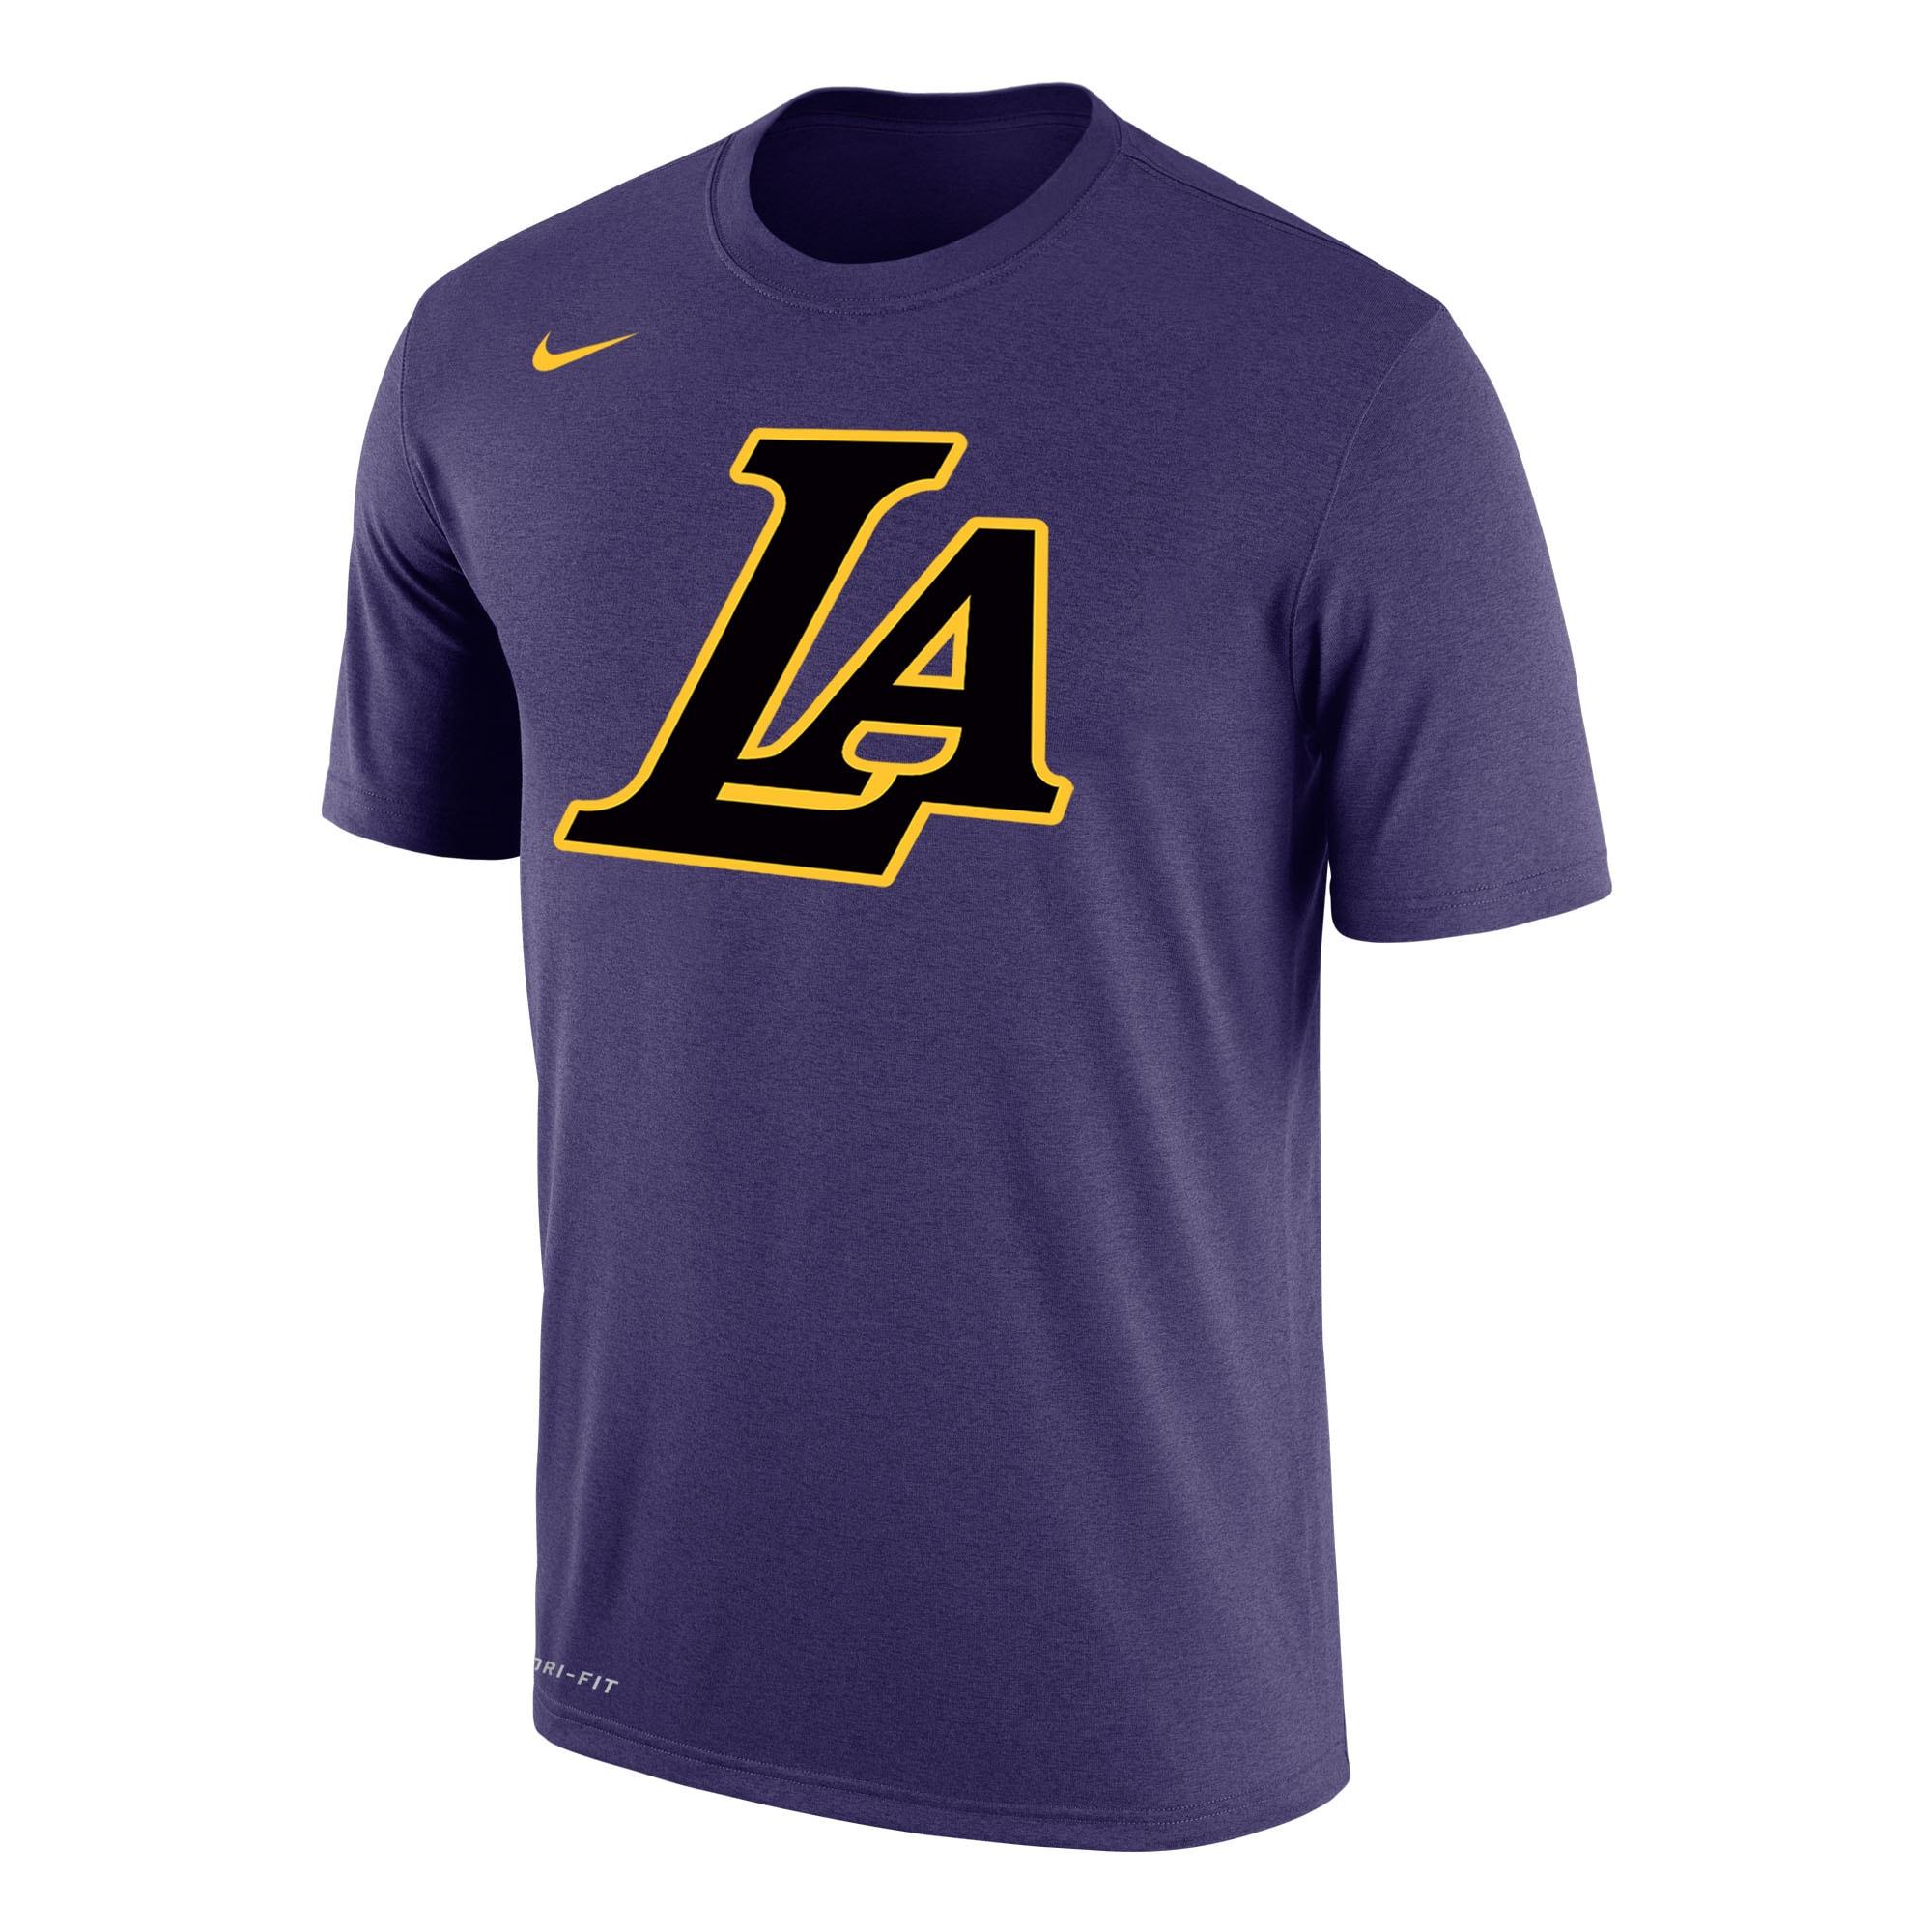 Los Angeles Lakers Nike City Edition Performance T-Shirt - Purple